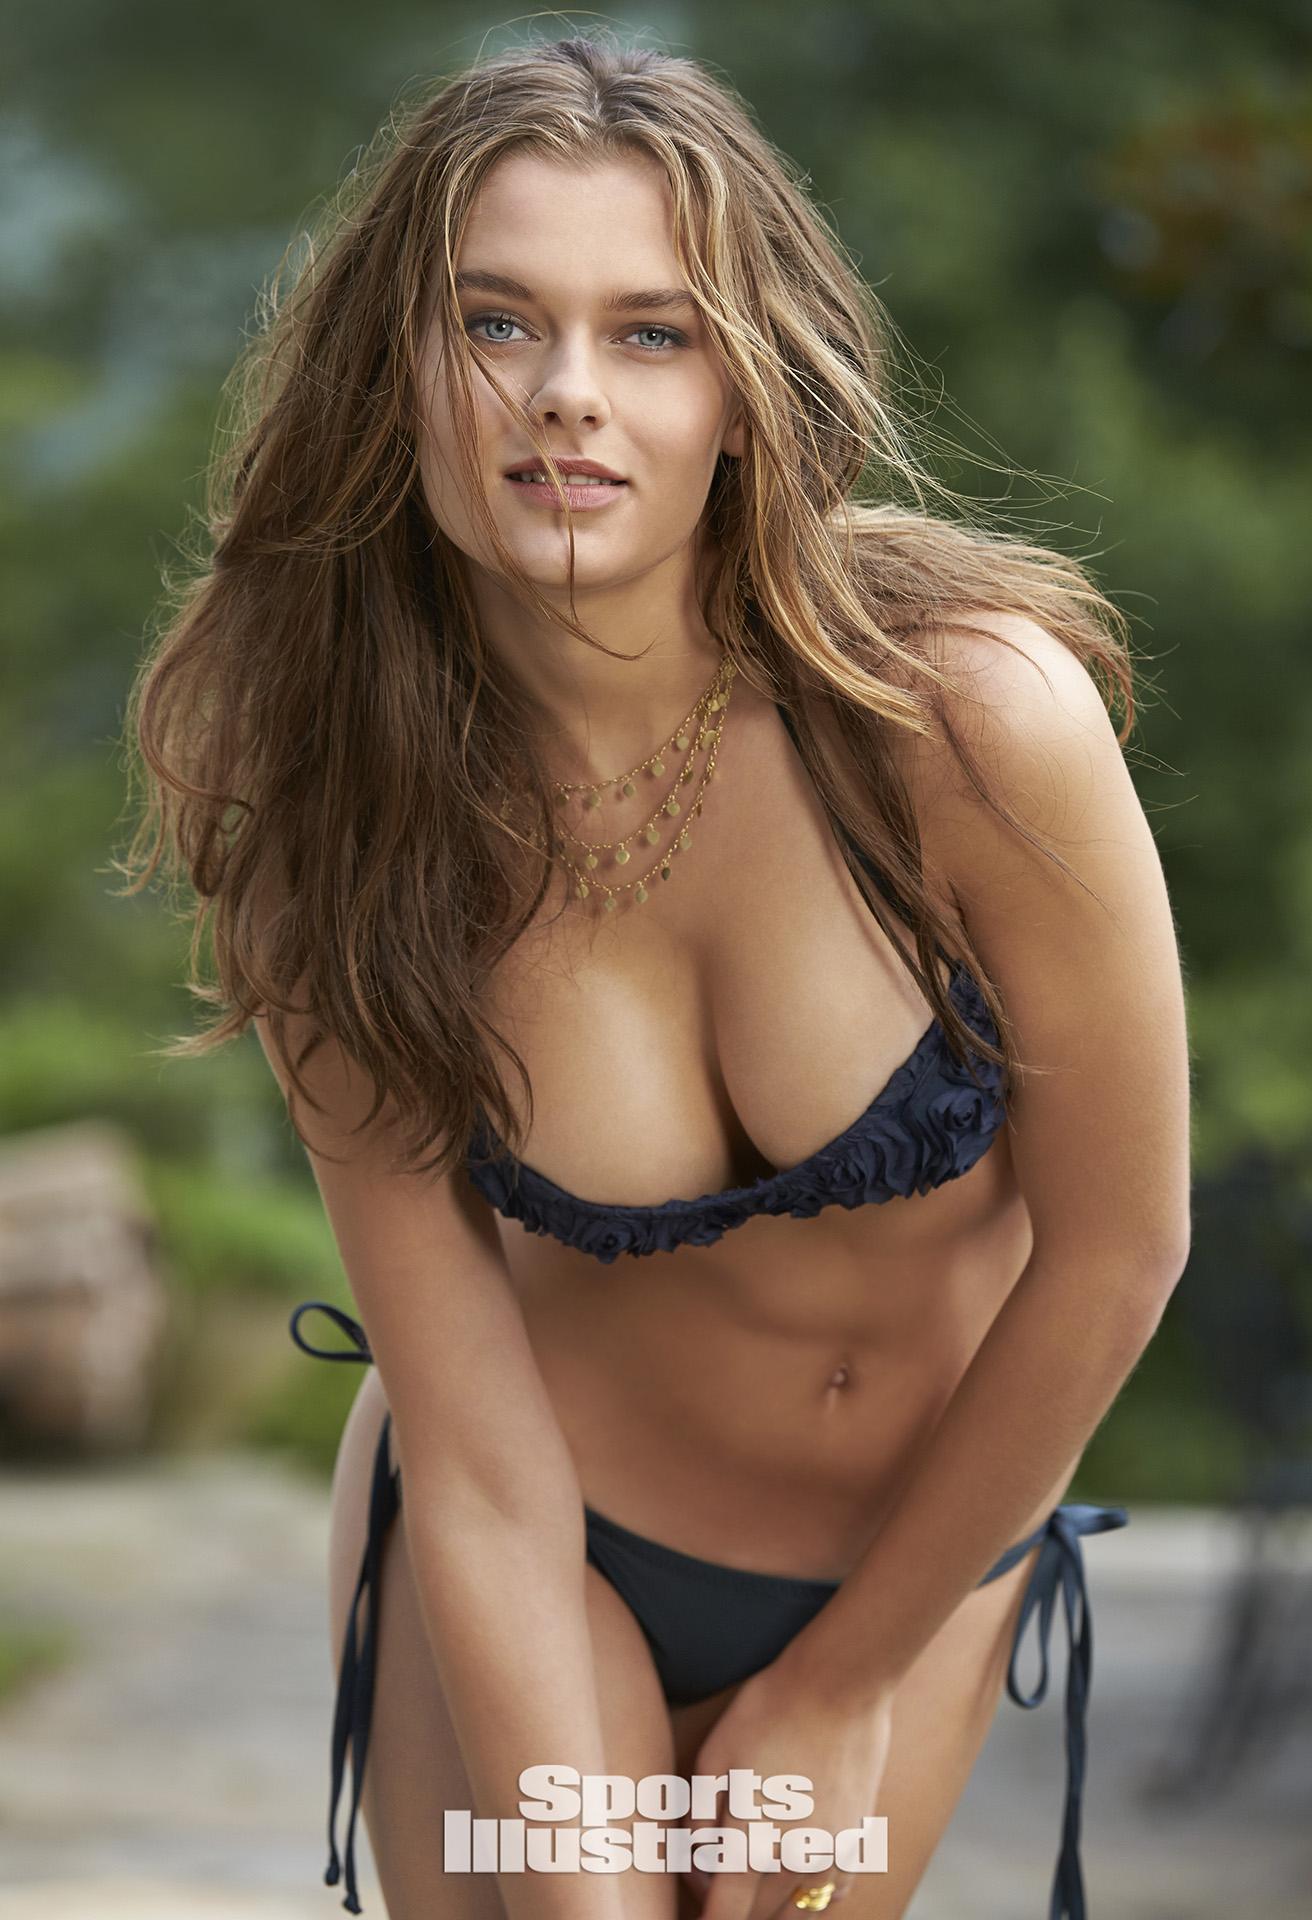 Cleavage Solveig Mork Hansen  nudes (31 images), Snapchat, bra